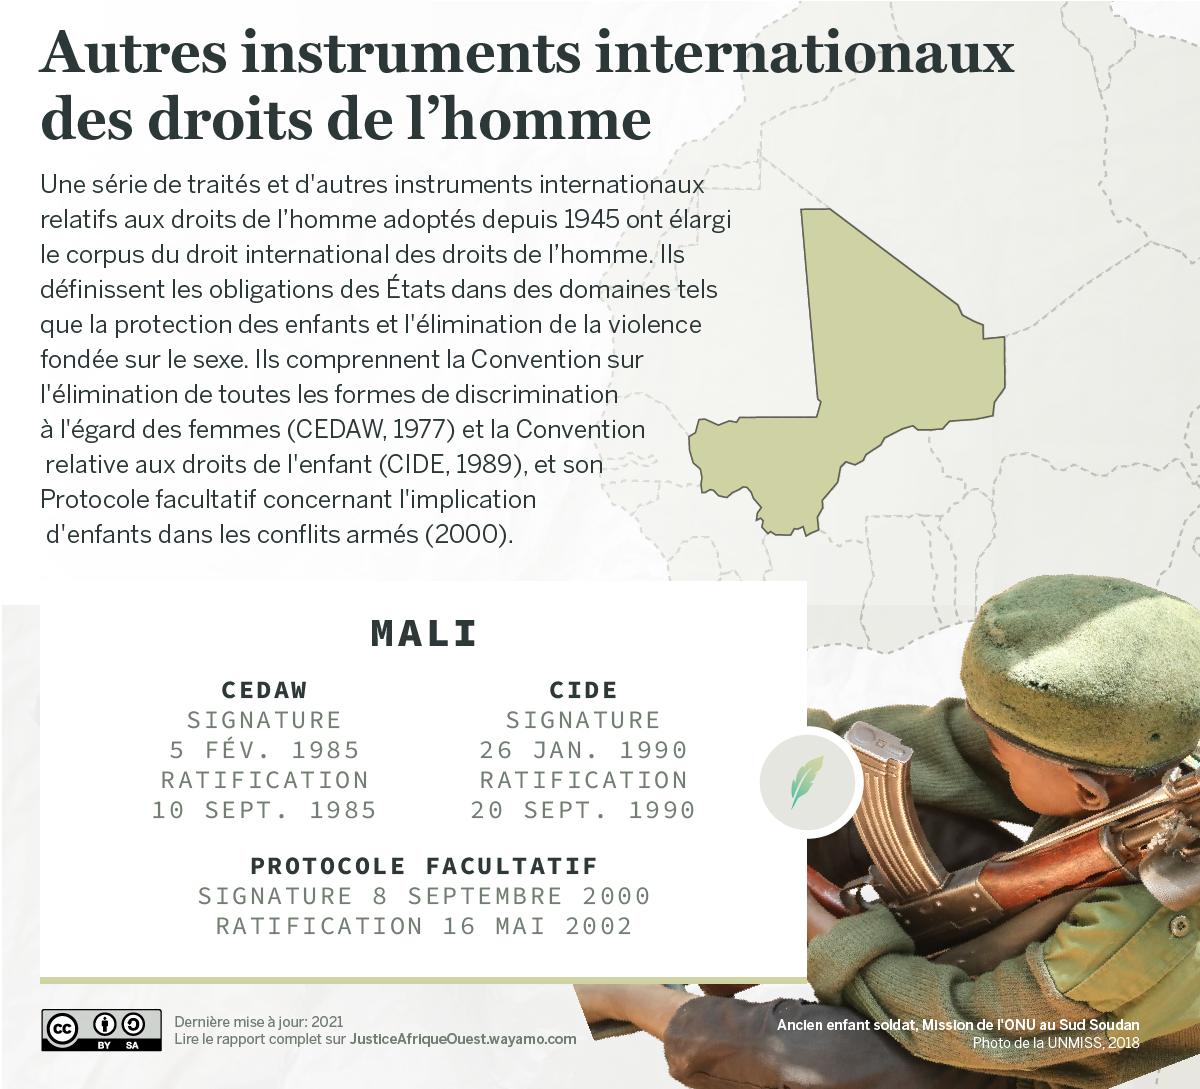 MALI_Droits de l'homme_2 - Wayamo Foundation (CC BY-SA 4.0)